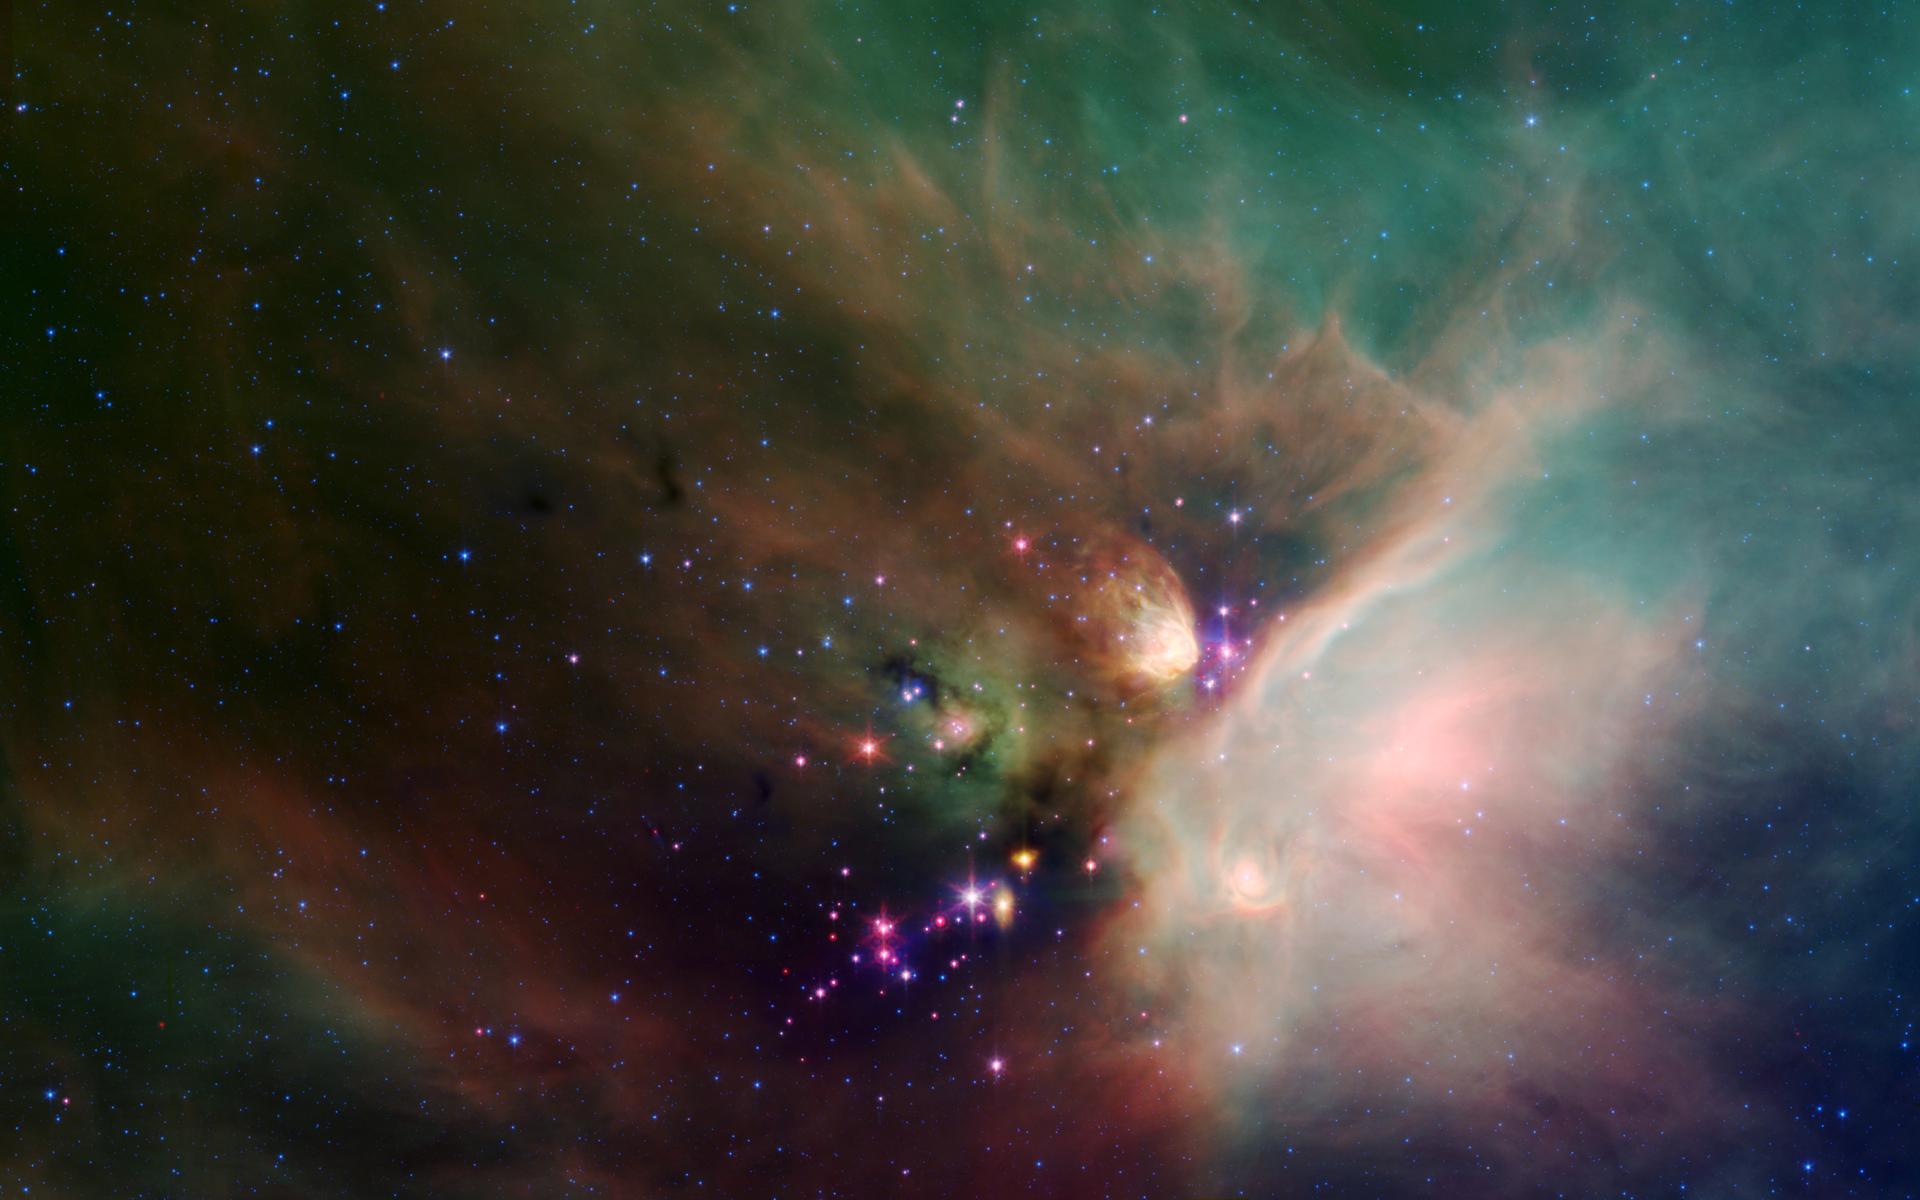 http://images3.alphacoders.com/846/84615.jpg